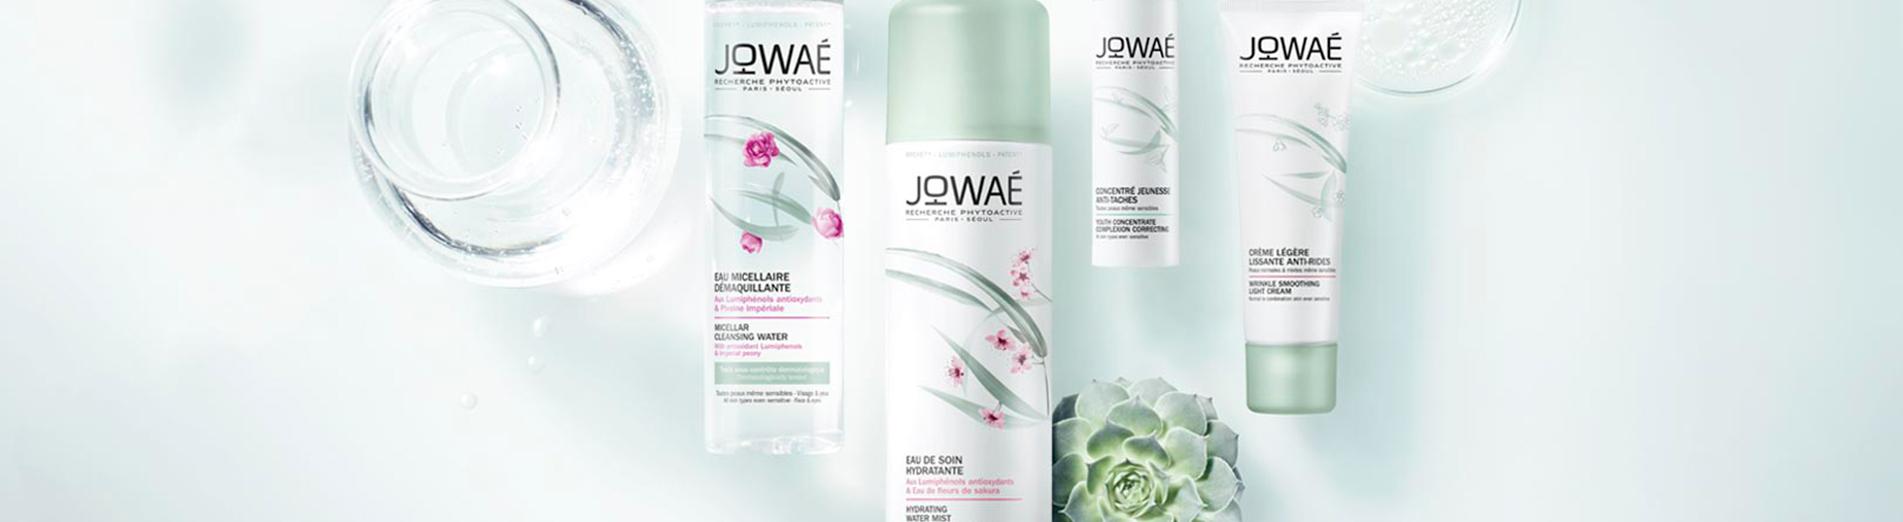 jowae-aveirofarma